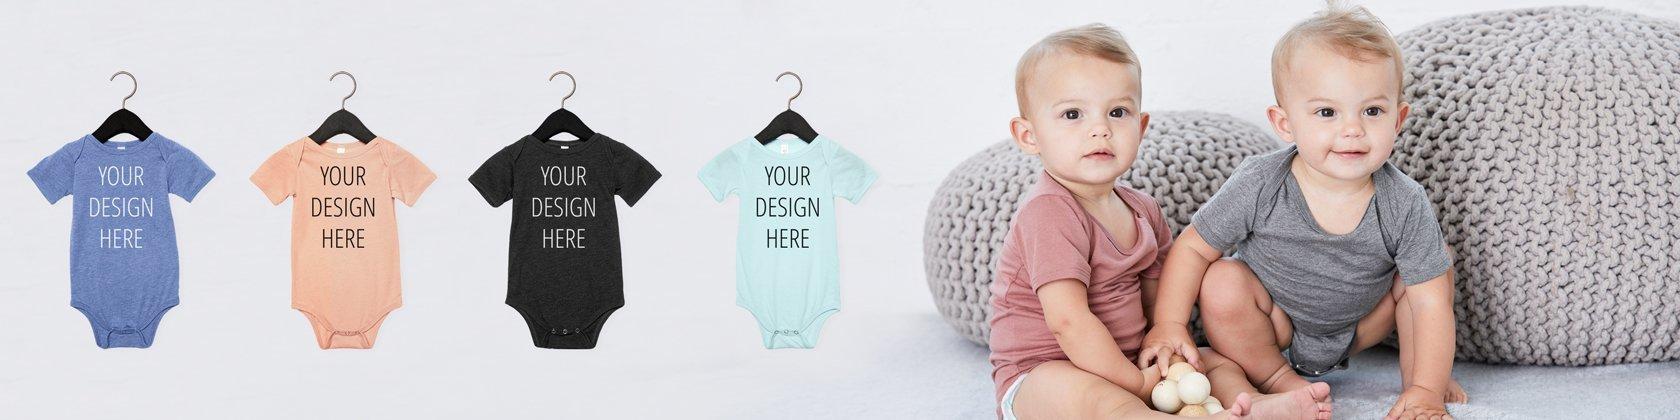 a06e7ab745e27 Custom Onesies, Personalized Baby Bodysuits